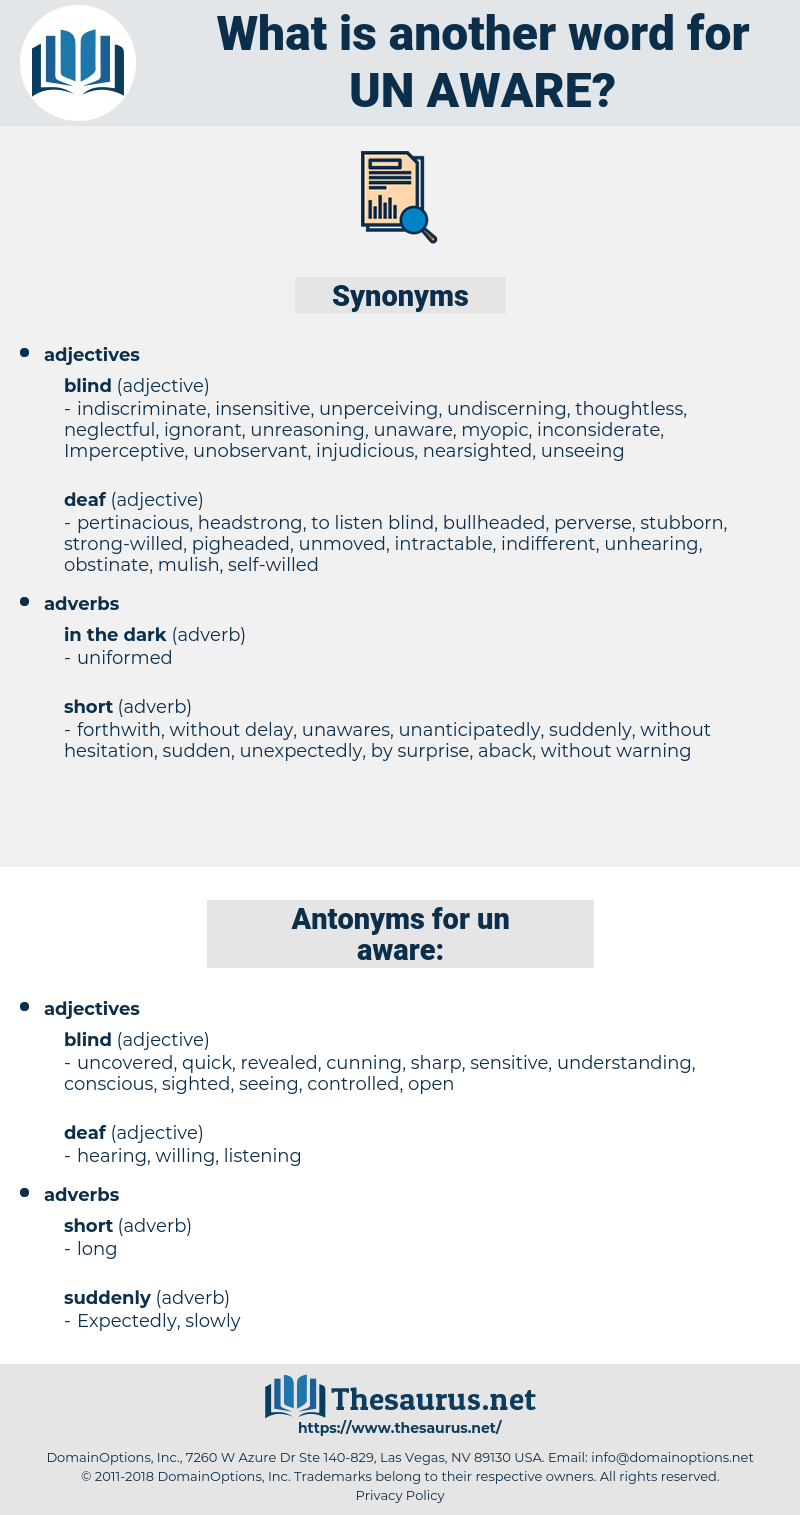 un-aware, synonym un-aware, another word for un-aware, words like un-aware, thesaurus un-aware